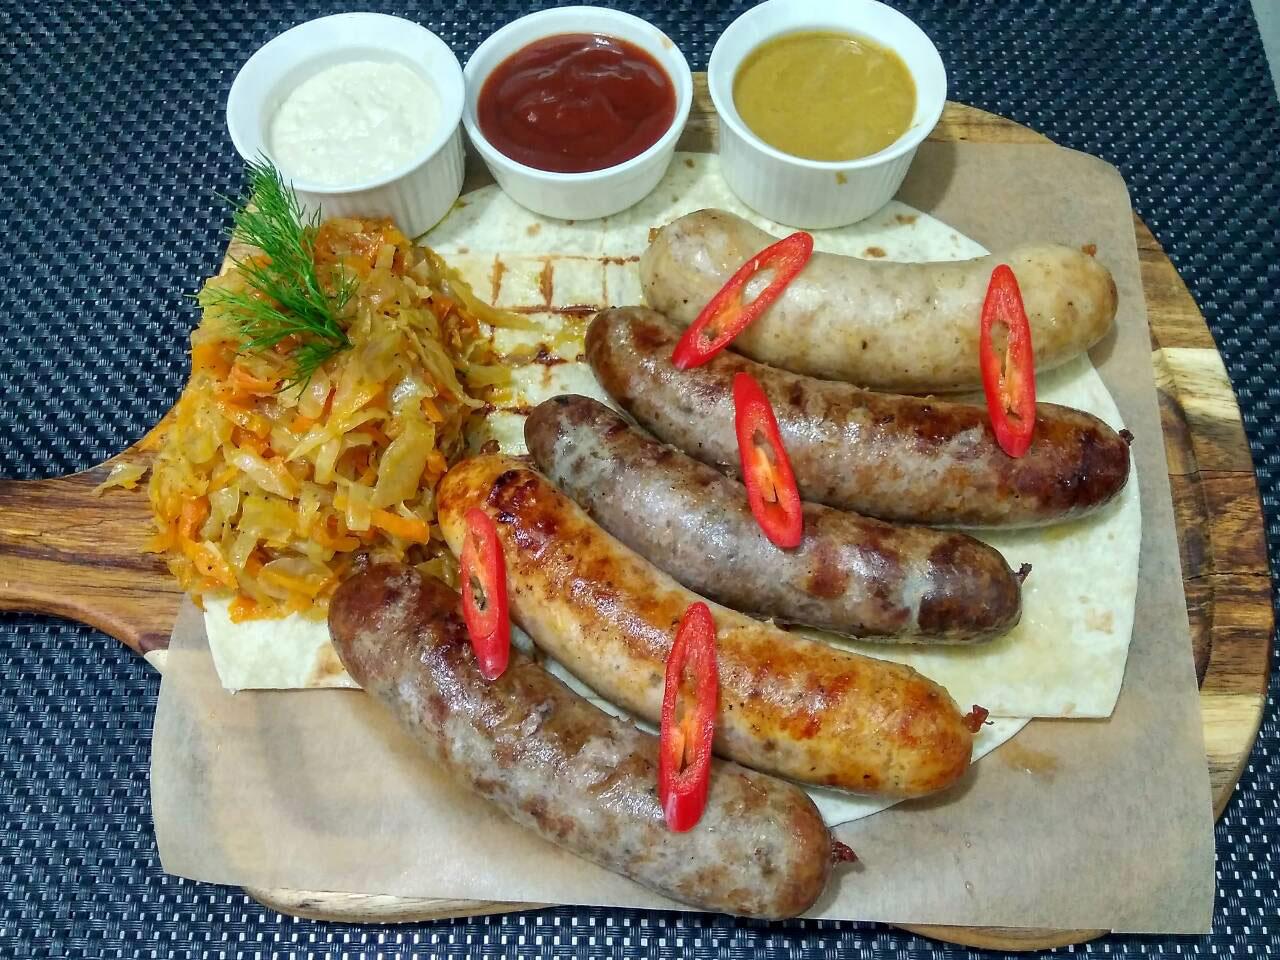 Колбаски Пять звезд - в ресторане Аннам Брахма в Оренбурге